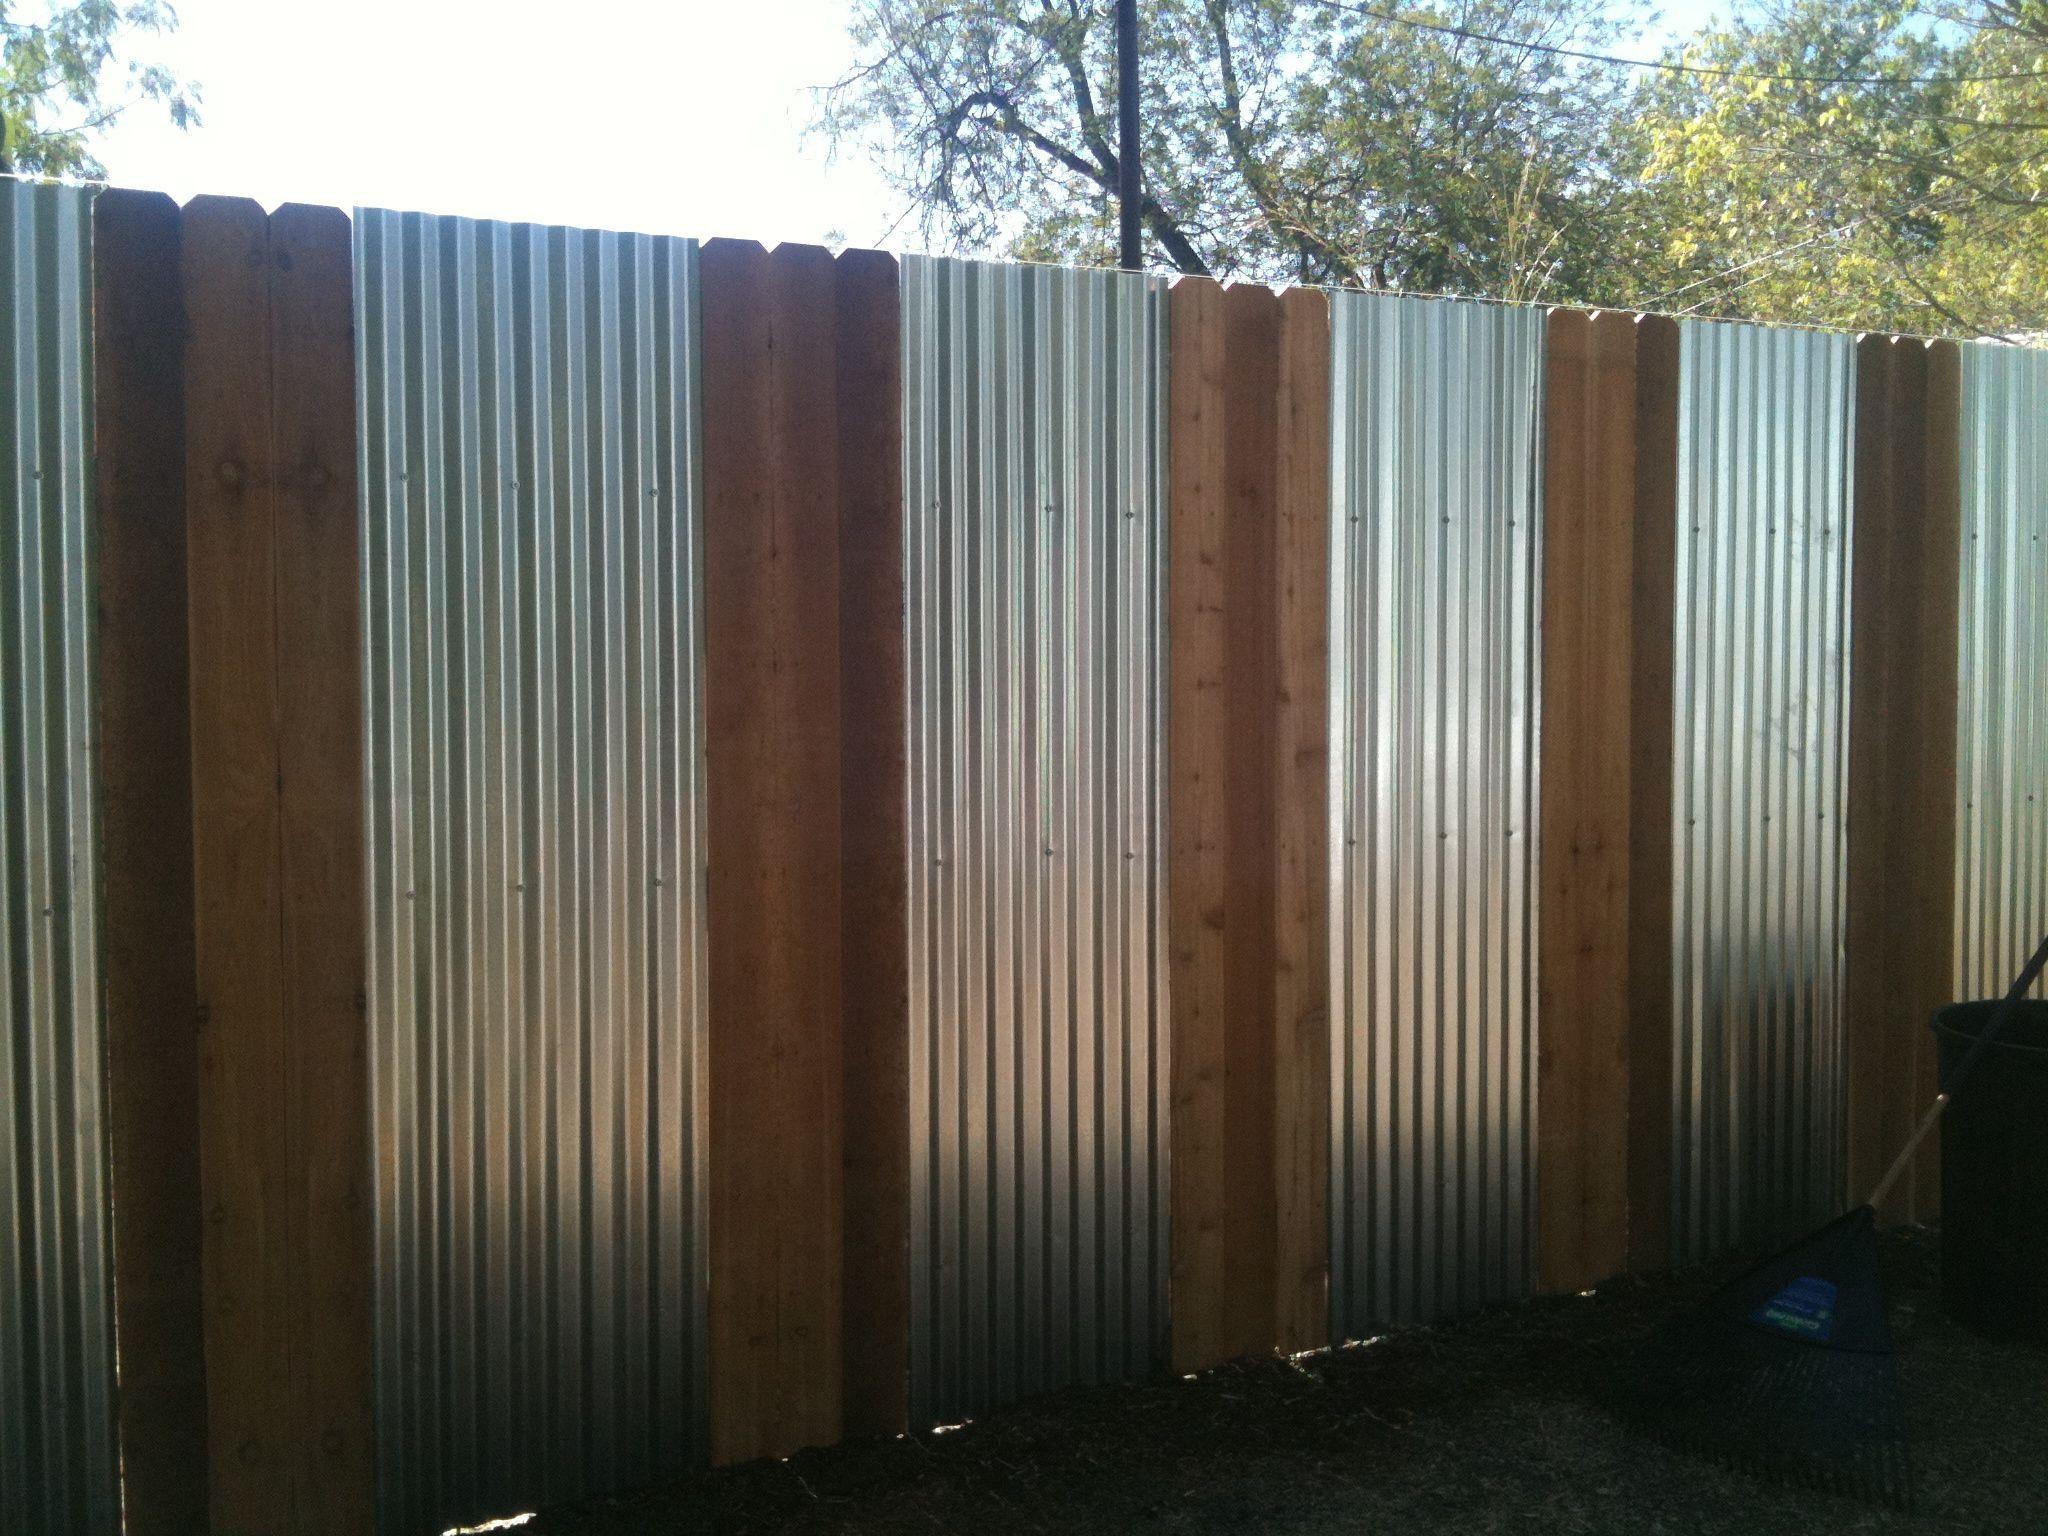 Trendy Metal and Cedarwood